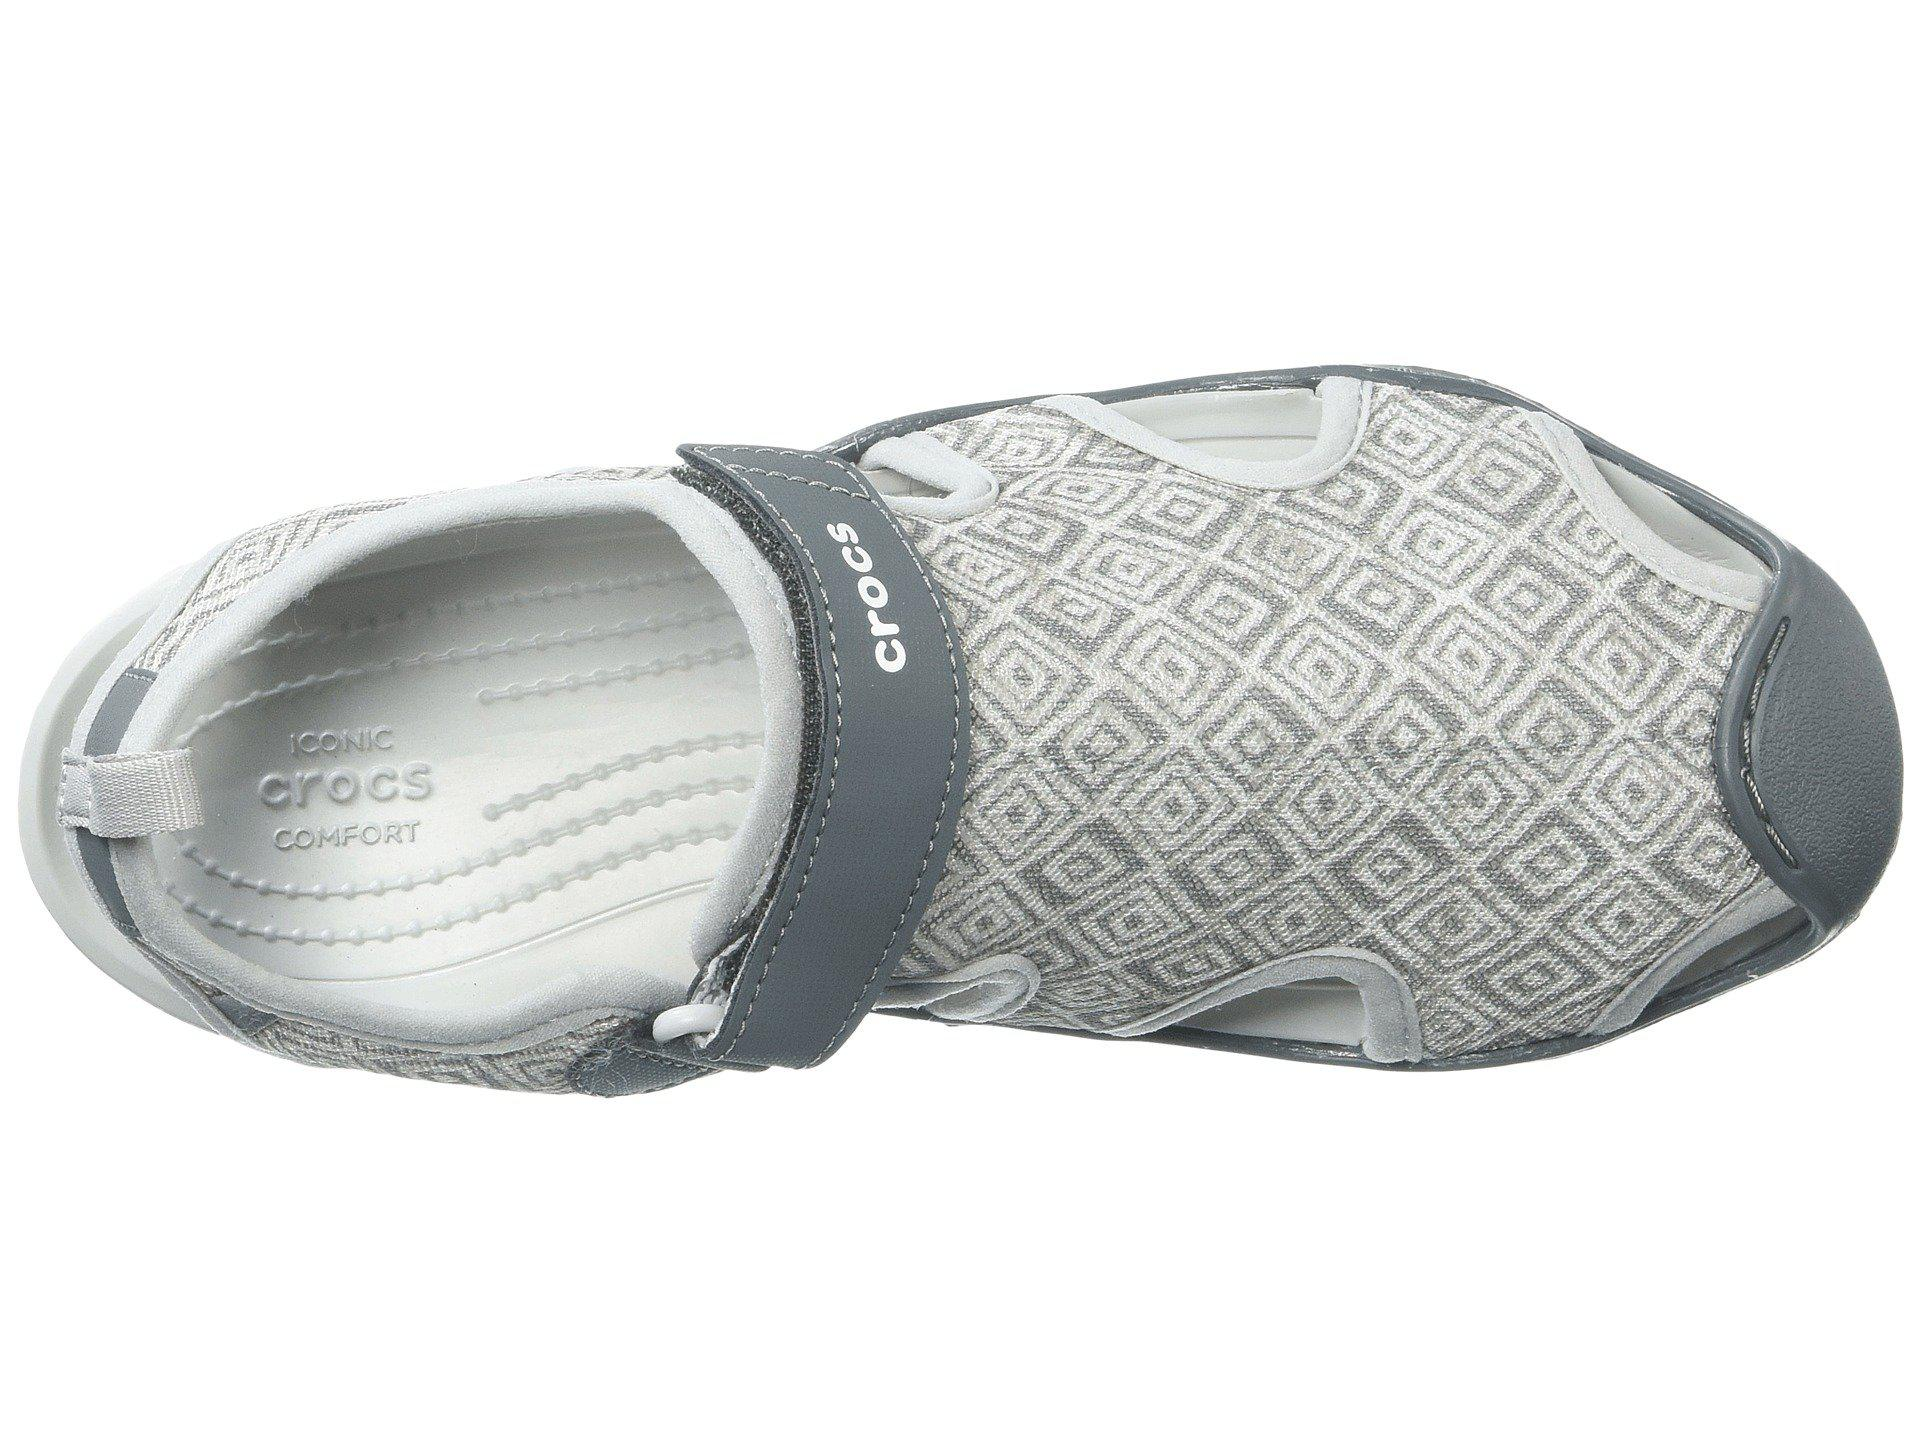 a1a8d43b312a Crocs™ - Gray Swiftwater Graphic Mesh Sandal - Lyst. View fullscreen